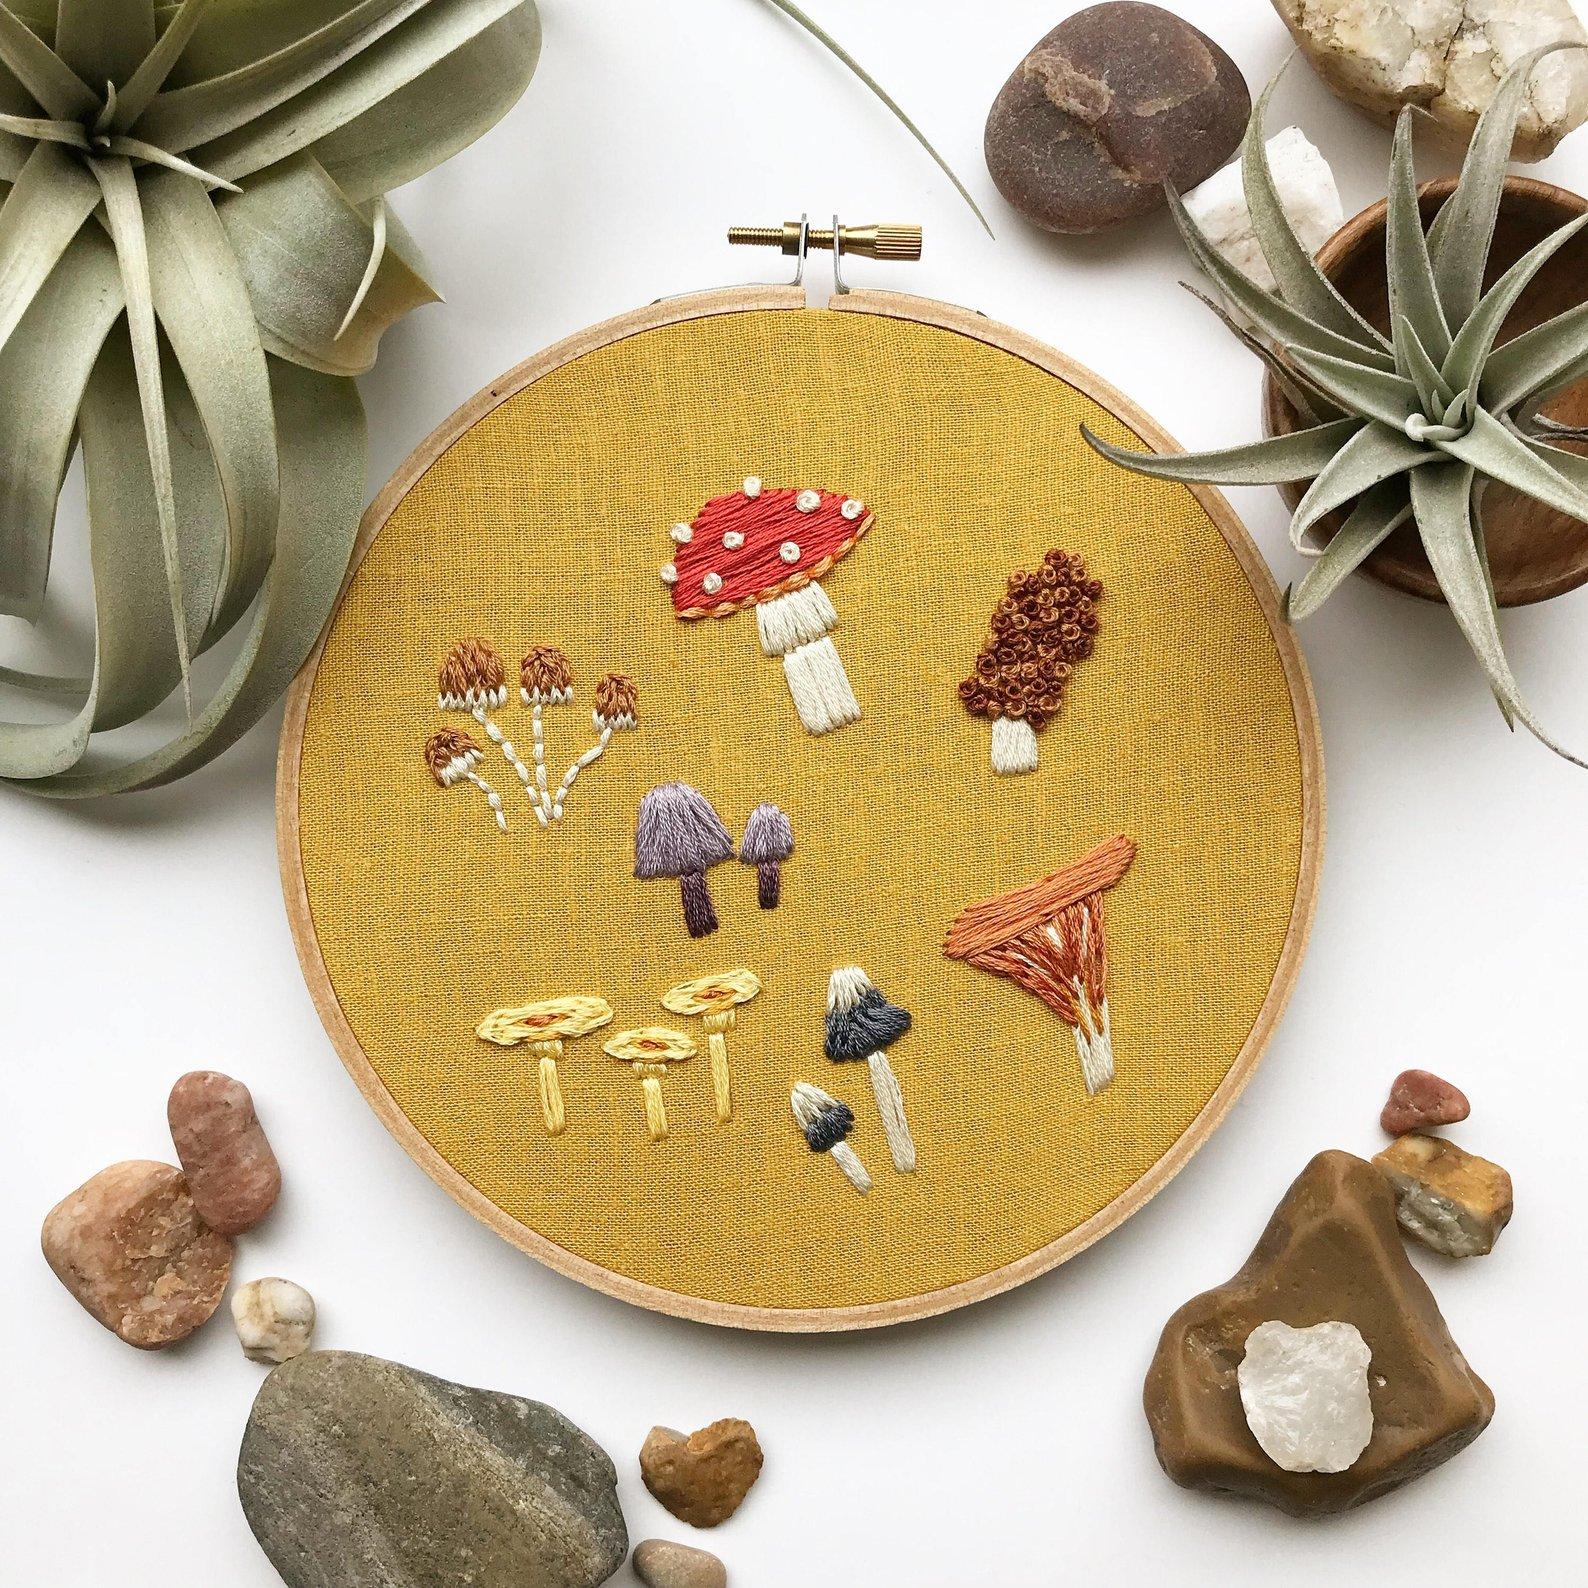 Mushroom Embroidery Art Hoop By Lemon Made Shop